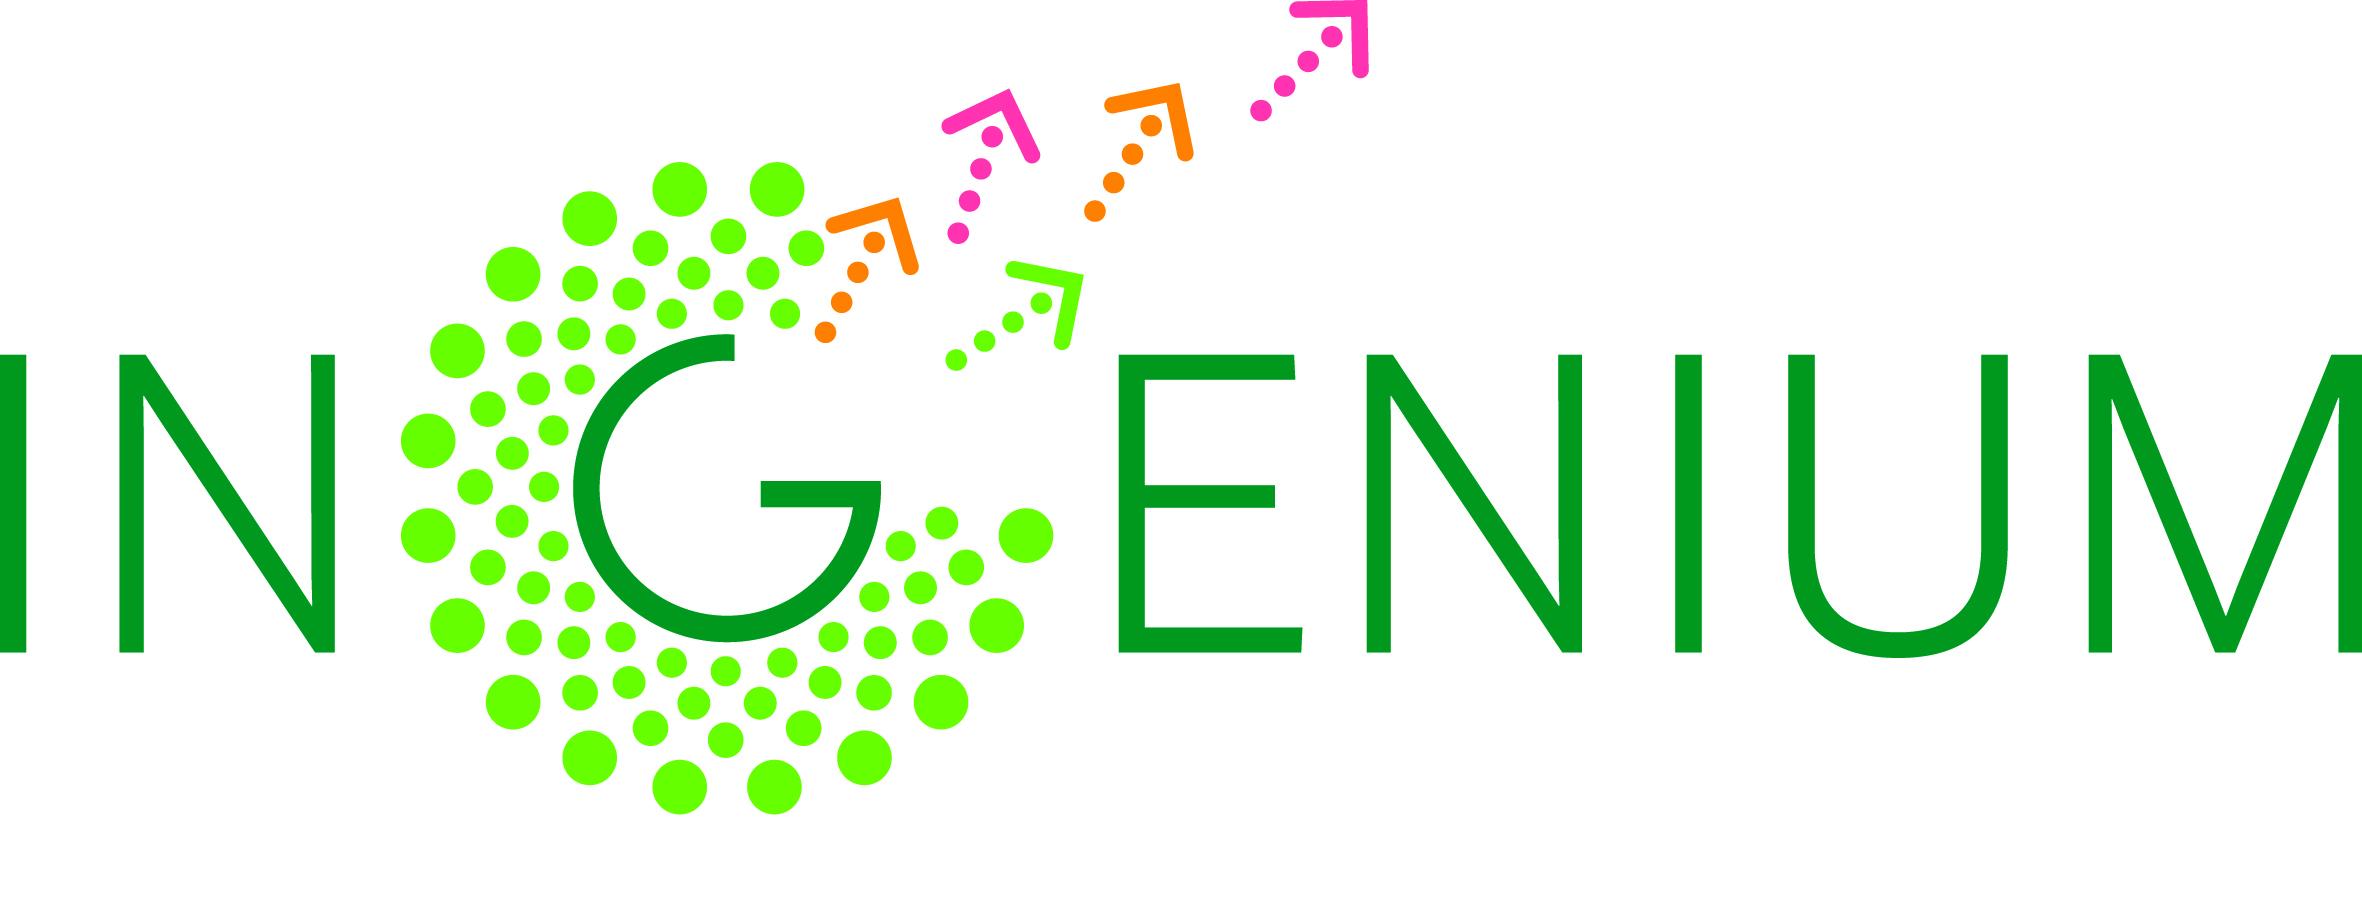 naturex global leader in specialty plant based natural ingredients